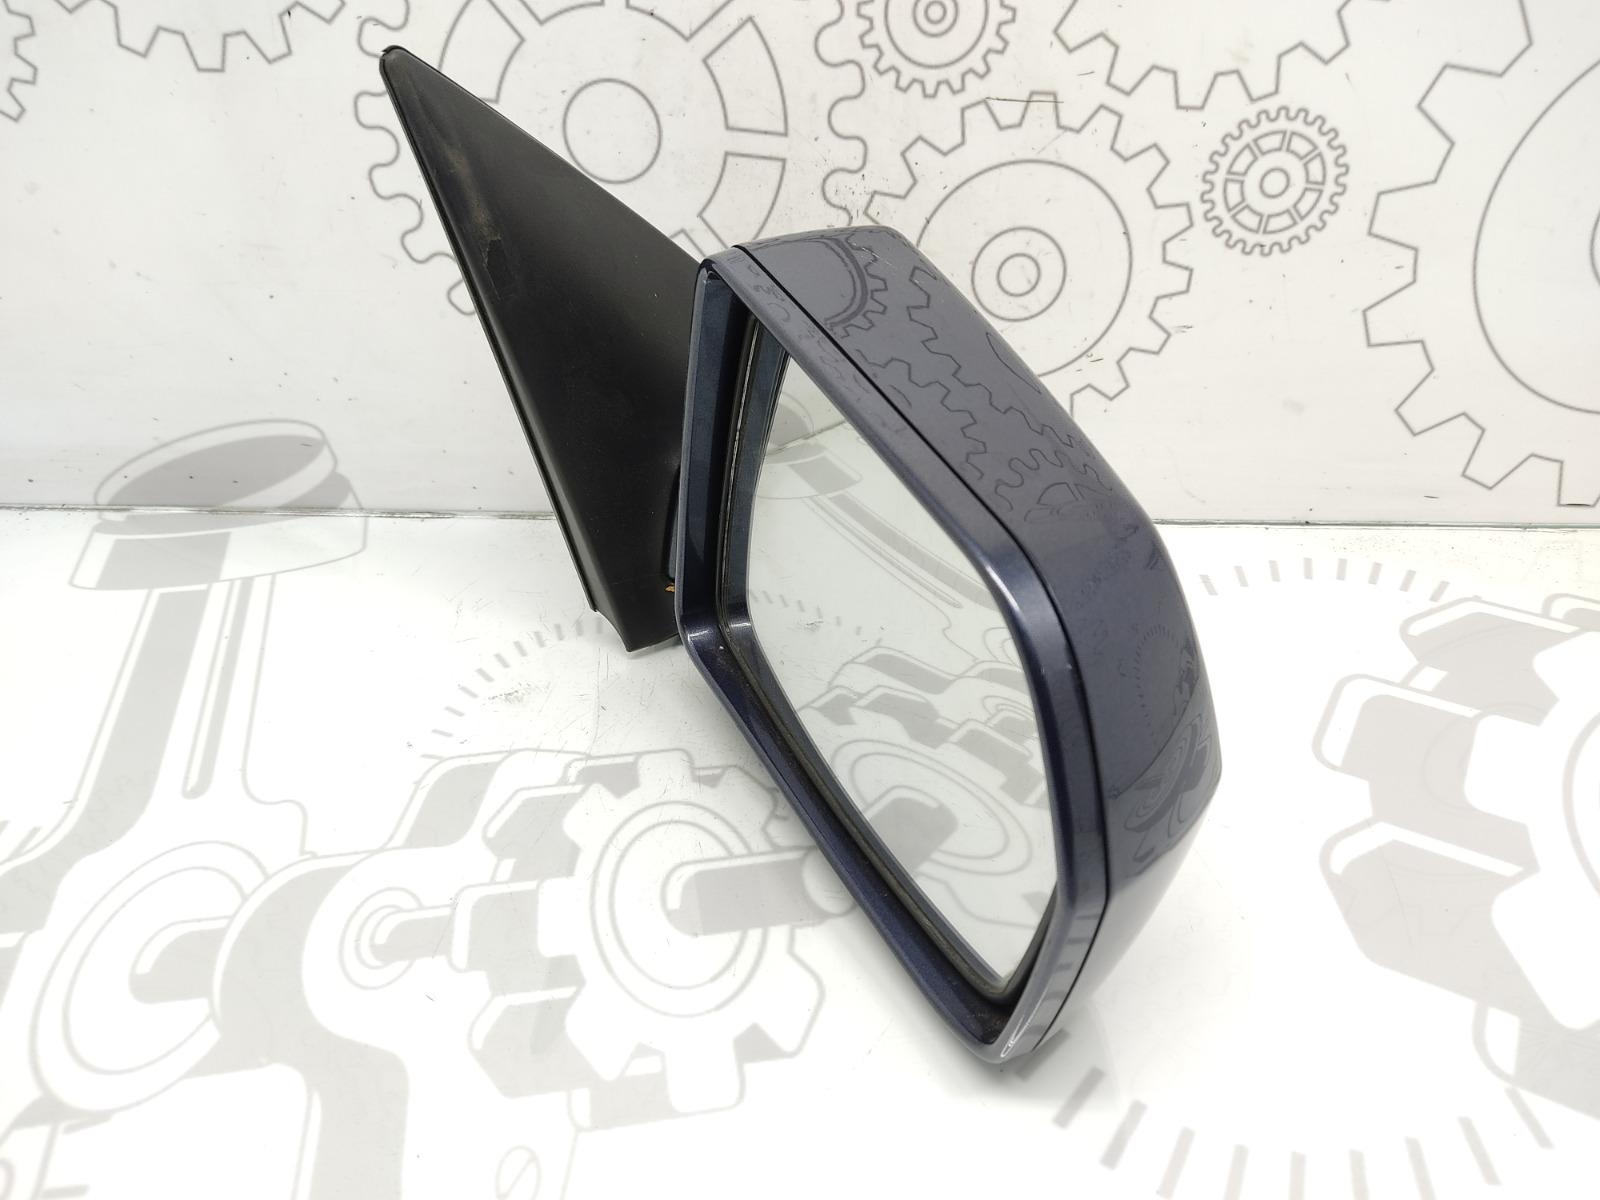 Зеркало наружное правое Kia Sportage 2.0 CRDI 2009 (б/у)